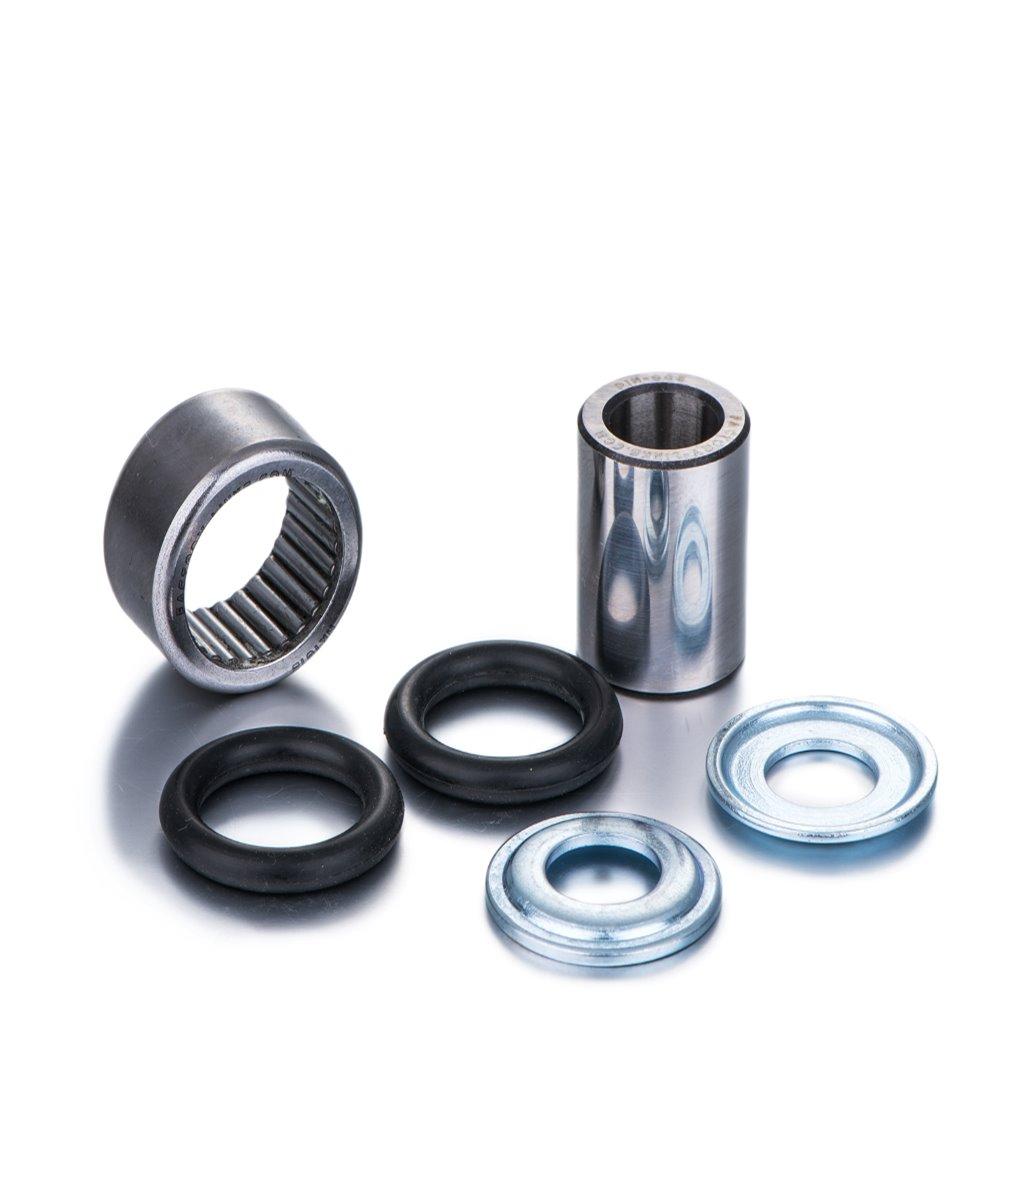 Lower Shock Absorber Bearing Kits, Gas Gas EC 125, 2001-2011, LSA-G-001